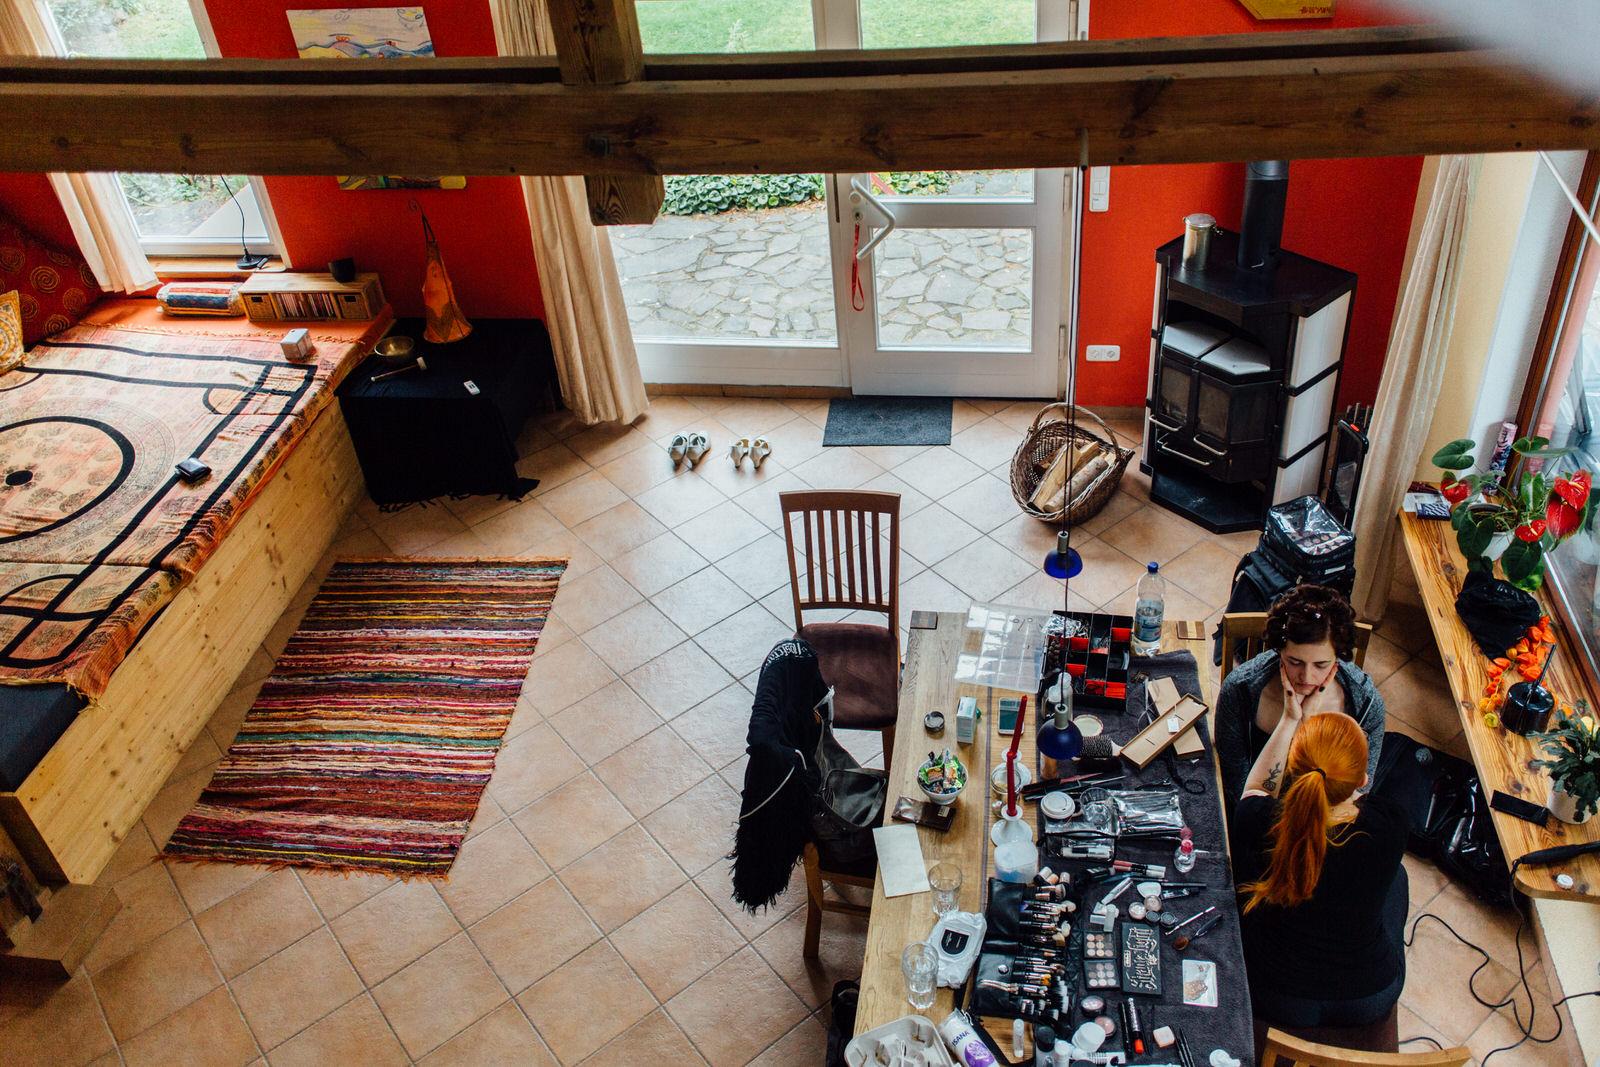 Paul_Traeger_Hochzeitsfotograf_Thueringen_Erfurt_Jena_Weimar_100223357.JPG